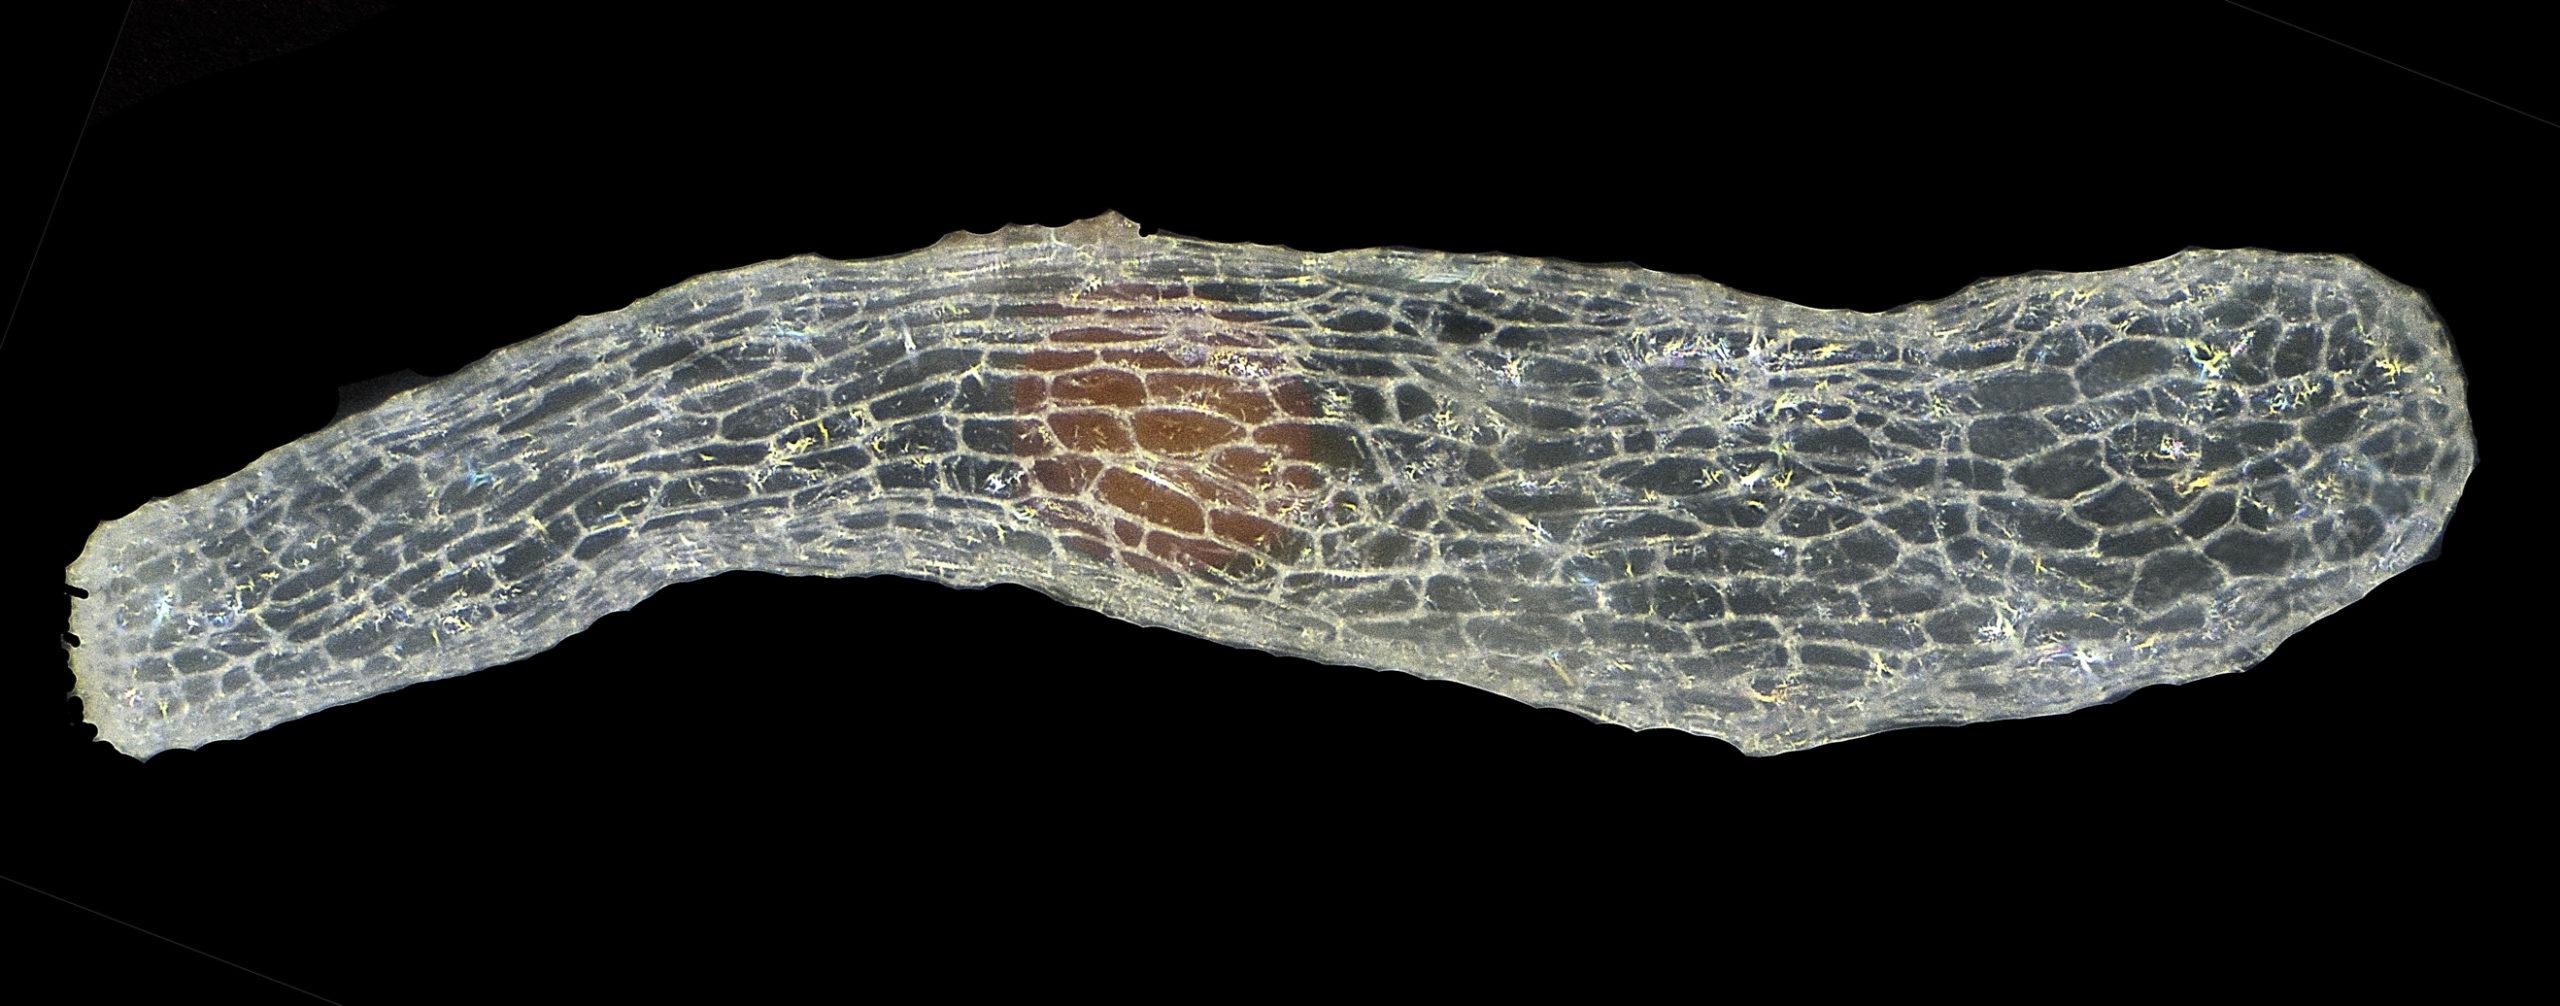 Limodorum abortivum 1,2 x 0,4 mm